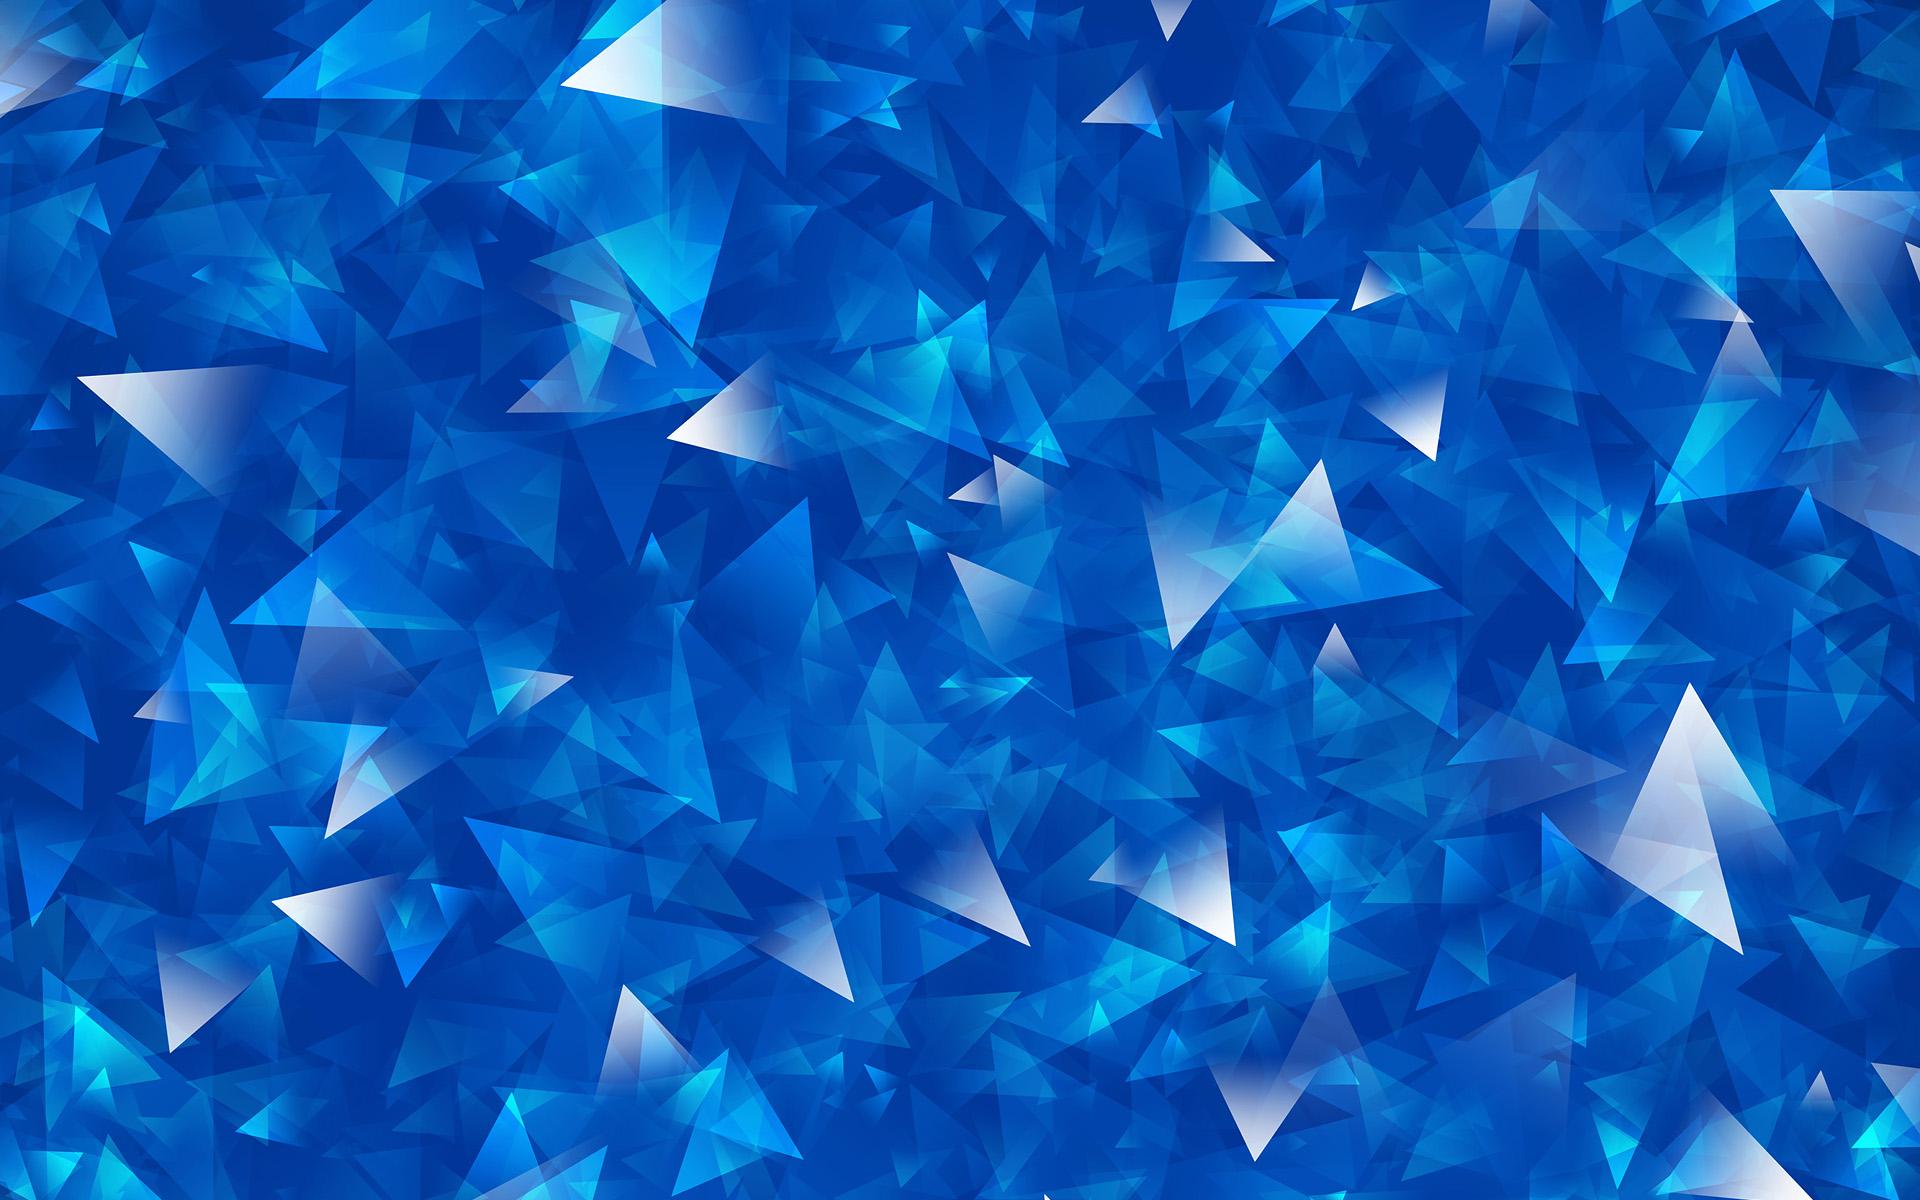 Blue Desktop Backgrounds   Wallpaper High Definition High Quality 1920x1200